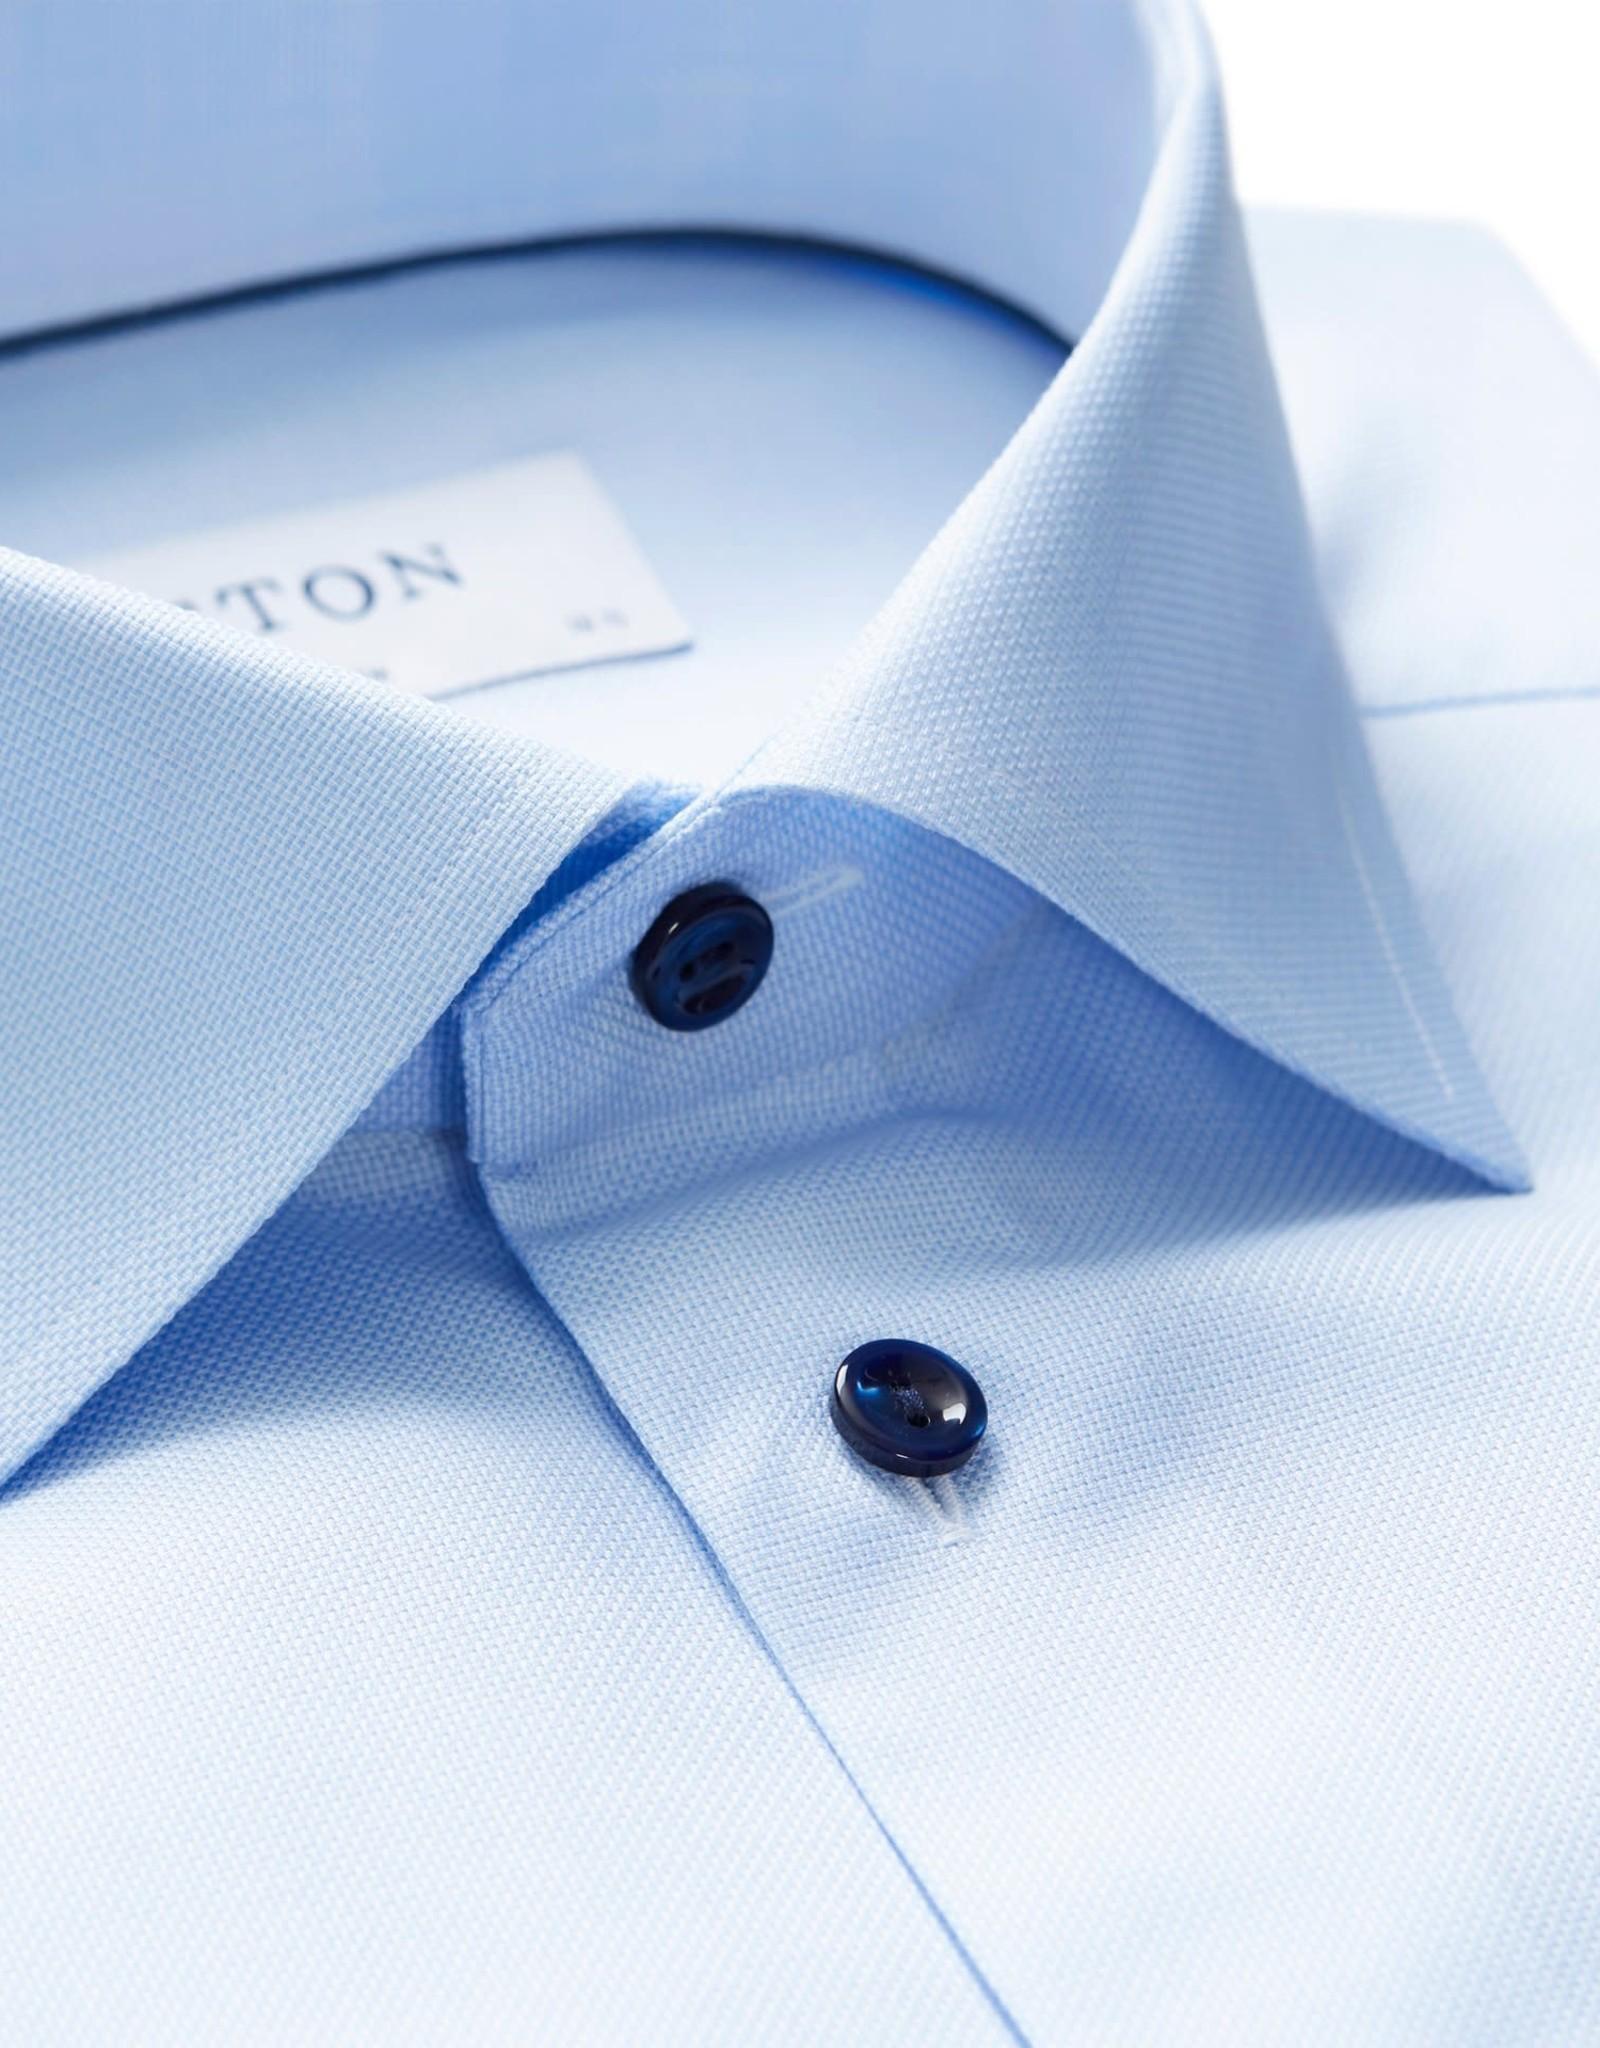 Eton Eton hemd blauw slim 3252-79544/22